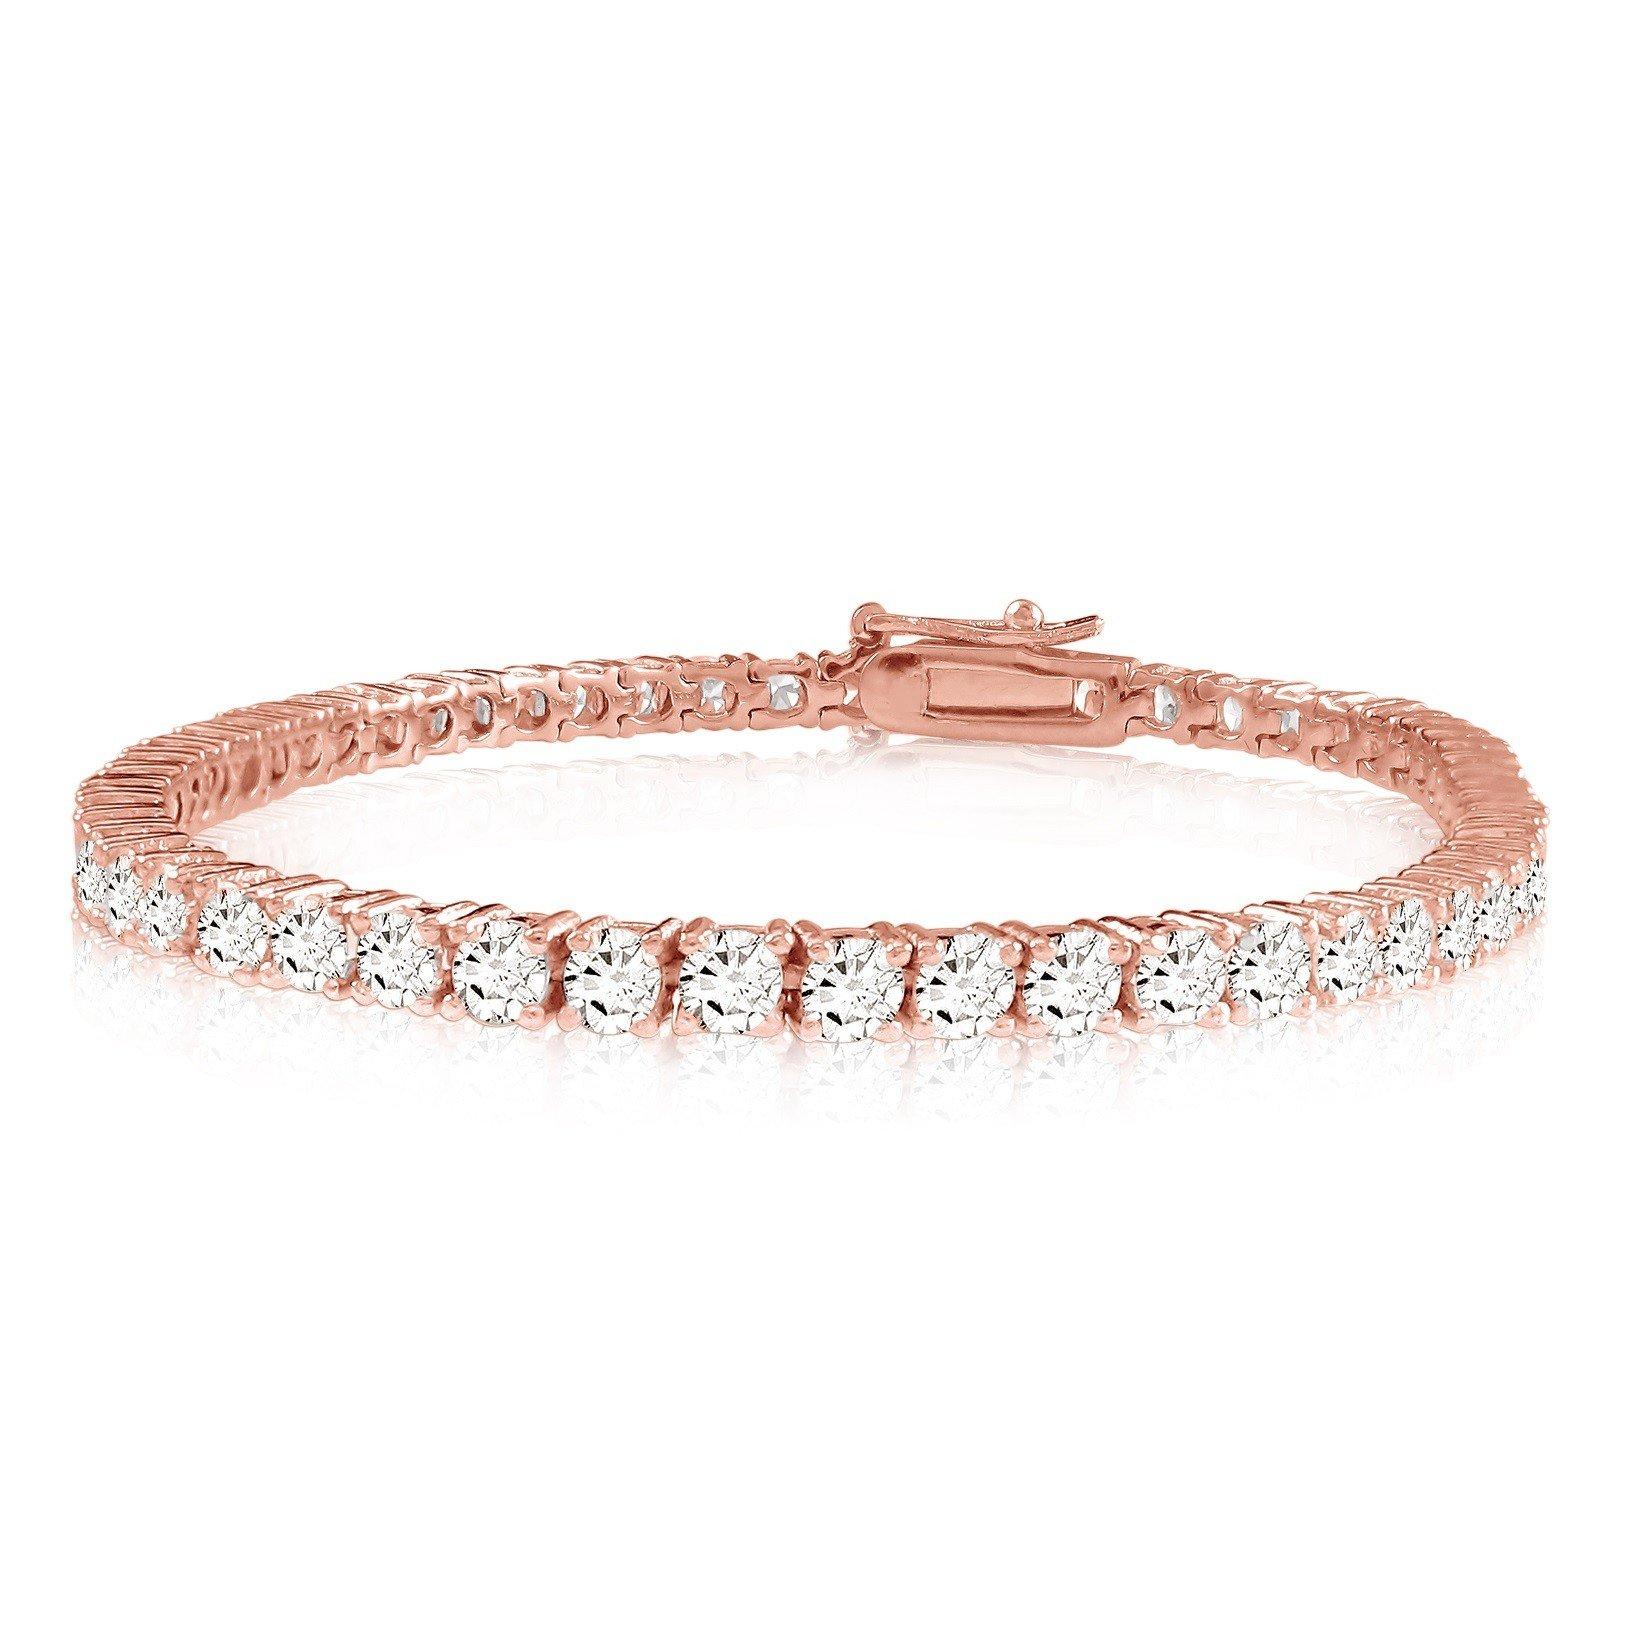 5 Carat Classic Diamond Tennis Bracelet 14K Rose Gold Value Collection by Diamond Manufacturers USA